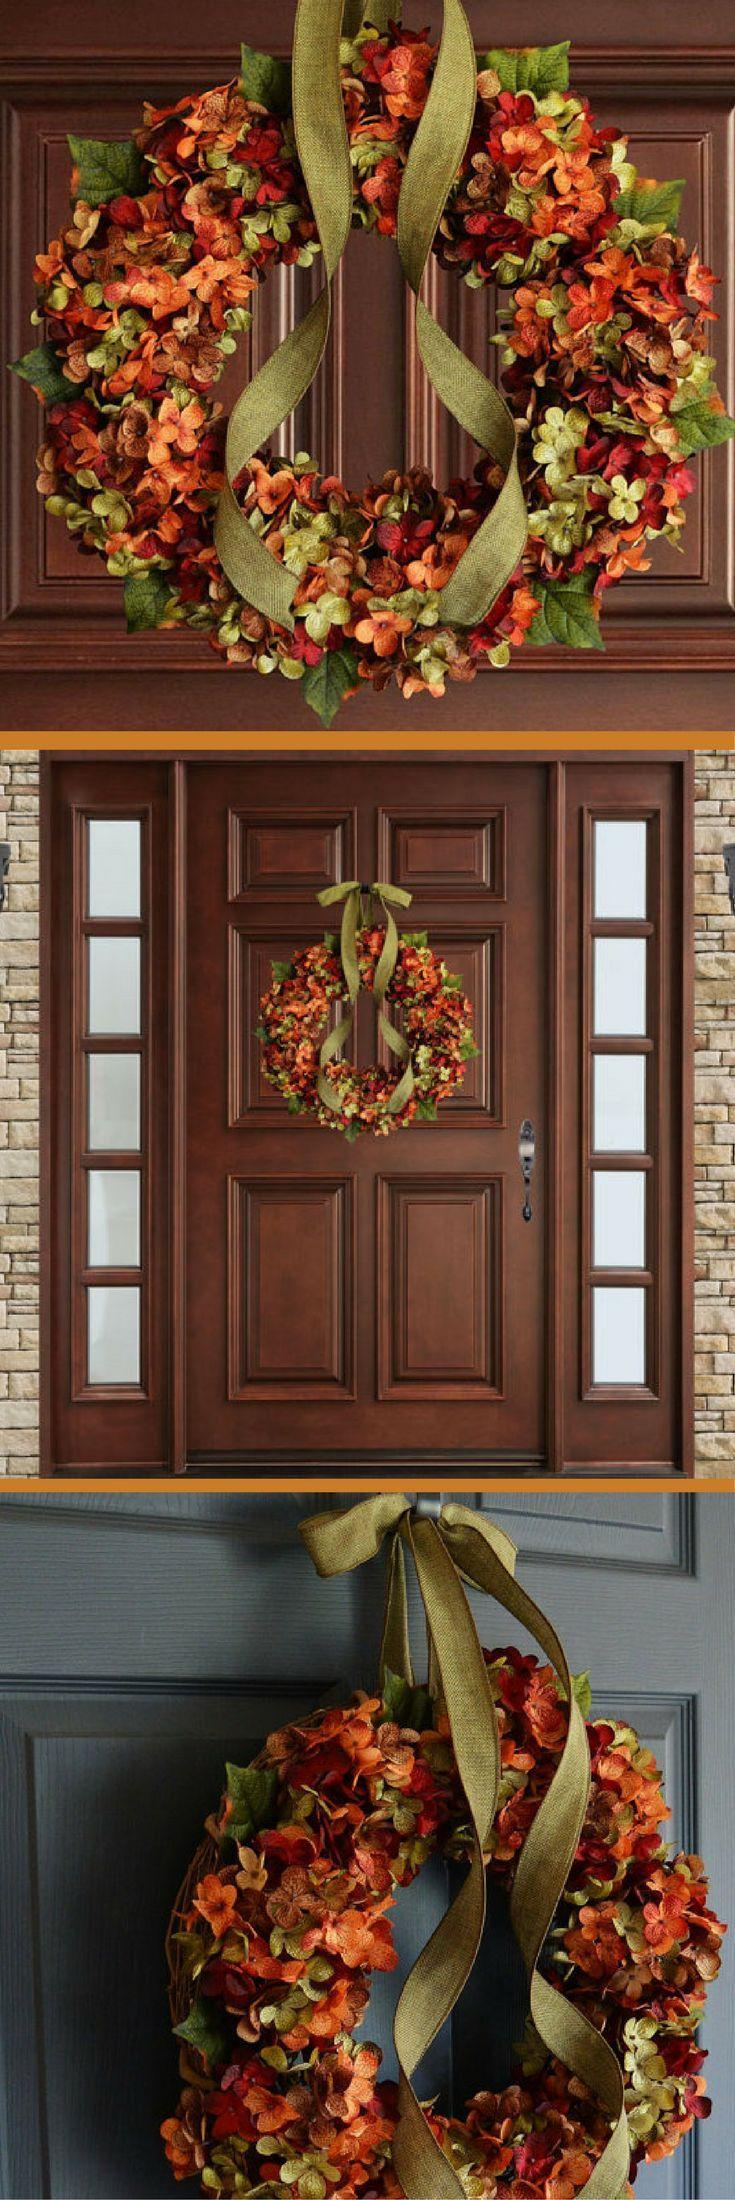 Fall Blended Hydrangea Wreath | Fall Decor | Autumn Wreaths | Front Door Wreaths | Outdoor Wreaths | Hydrangea Wreaths #ad #affiliatelink